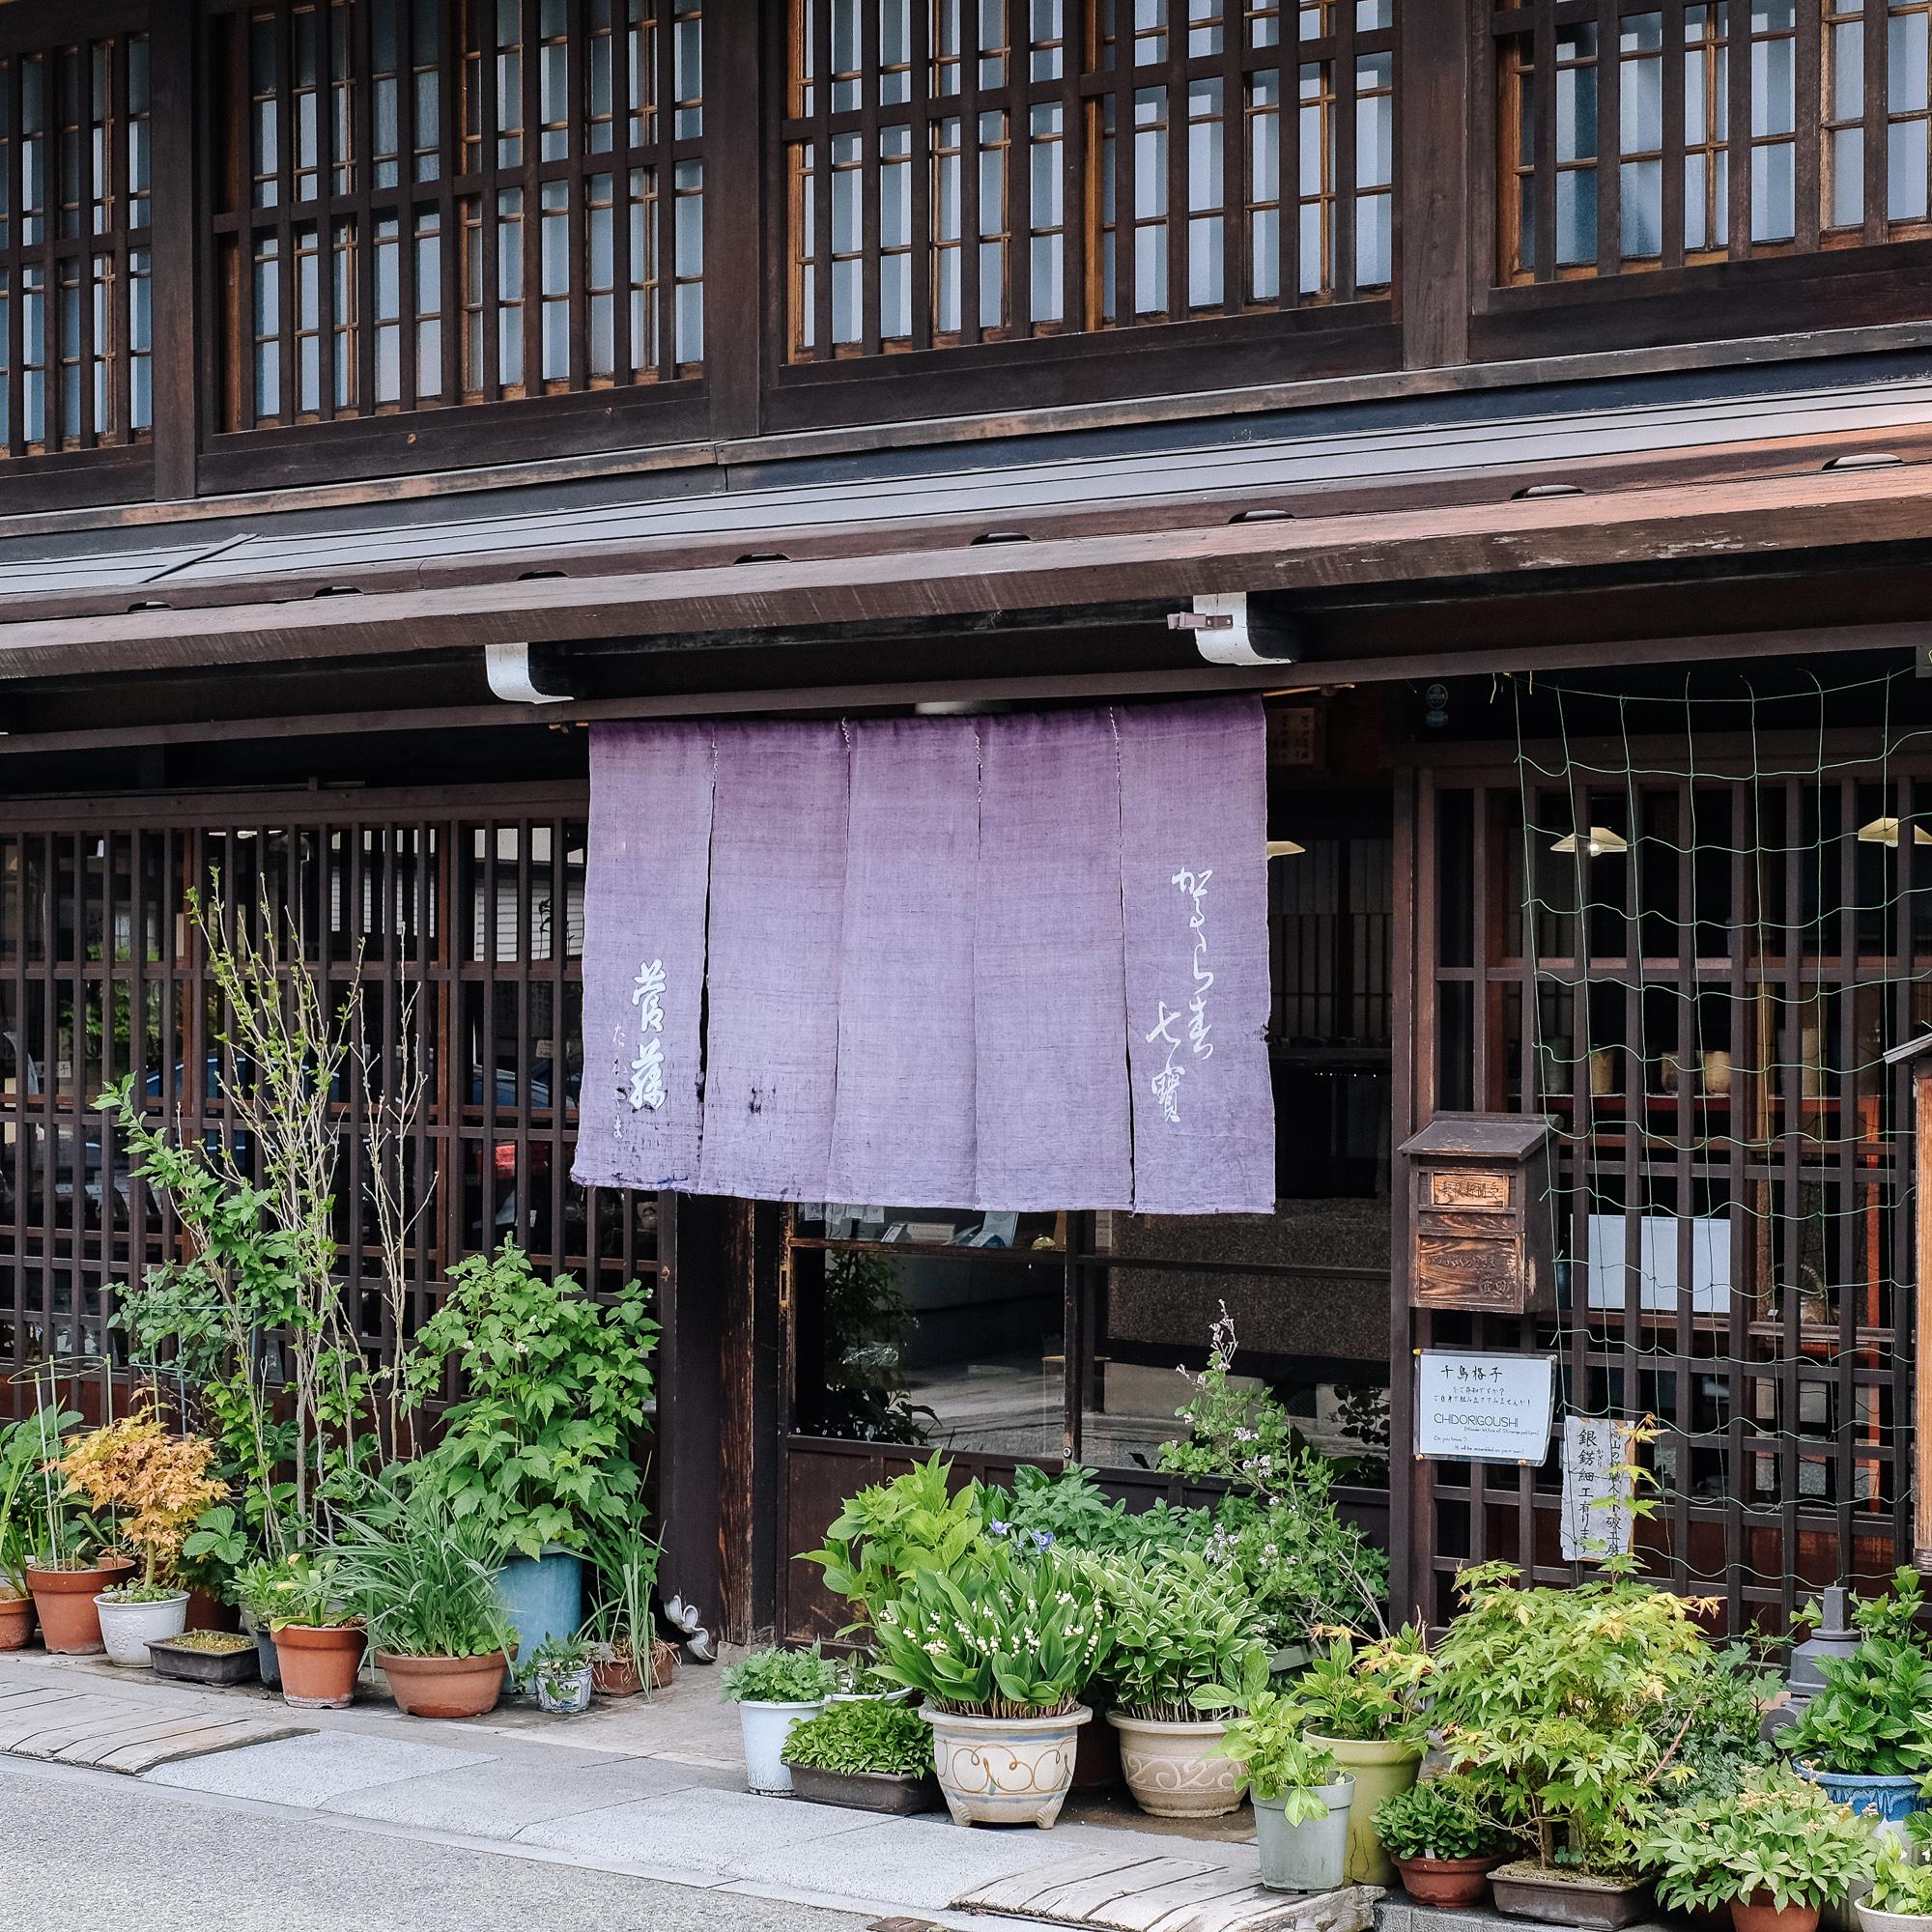 Sanmachi-Suji Takayama vieux quartier